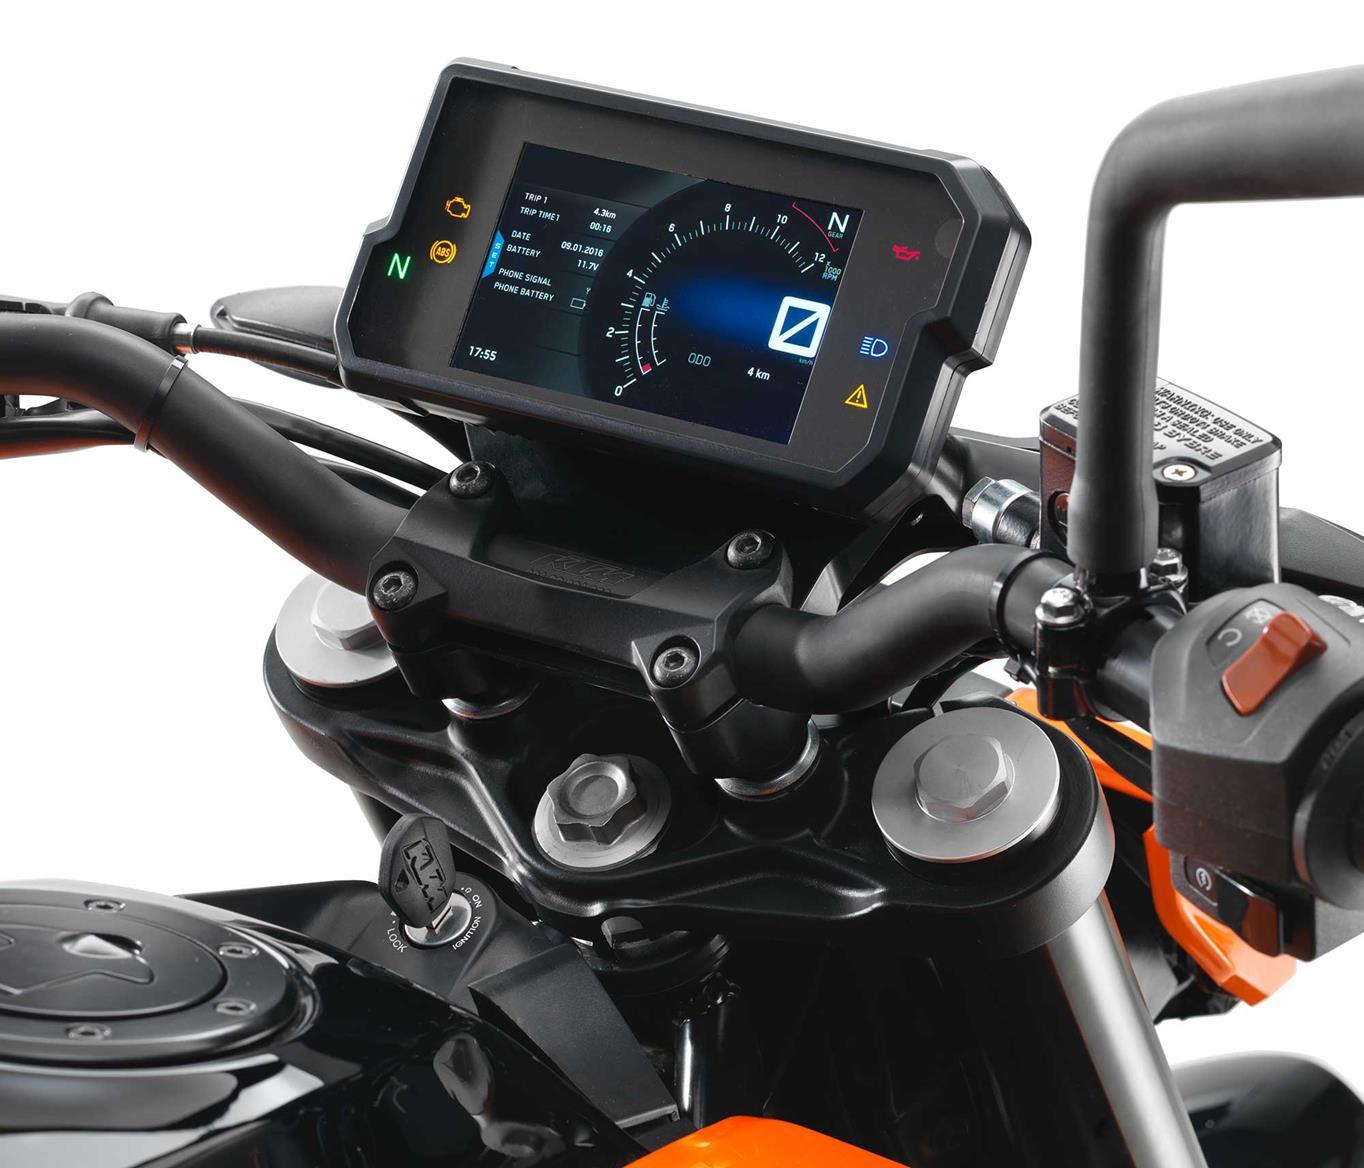 2017 125cc bike of the year ktm 125 duke mcn. Black Bedroom Furniture Sets. Home Design Ideas